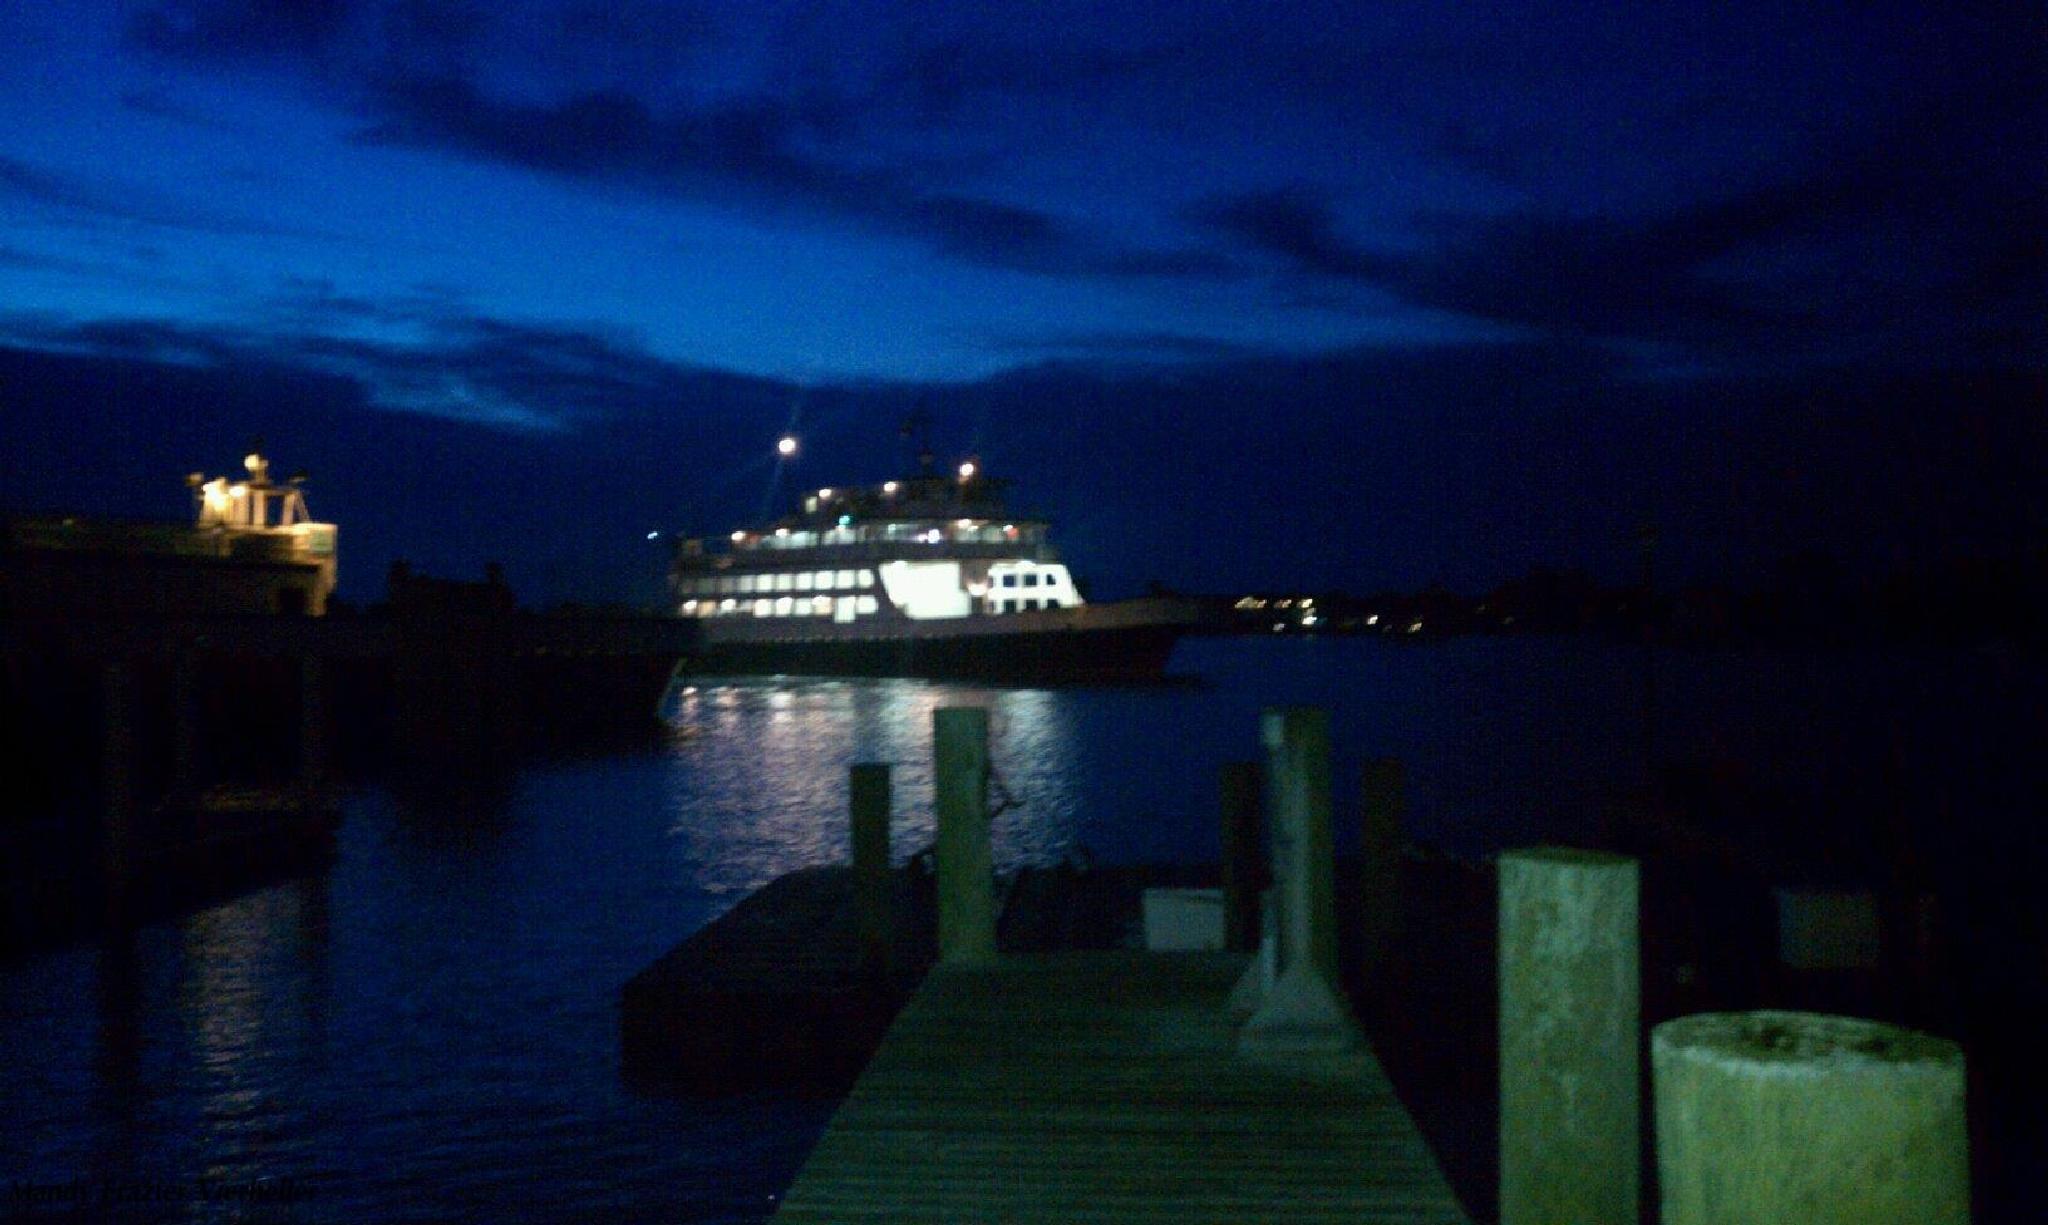 Ocracoke Ferry by naturelover49